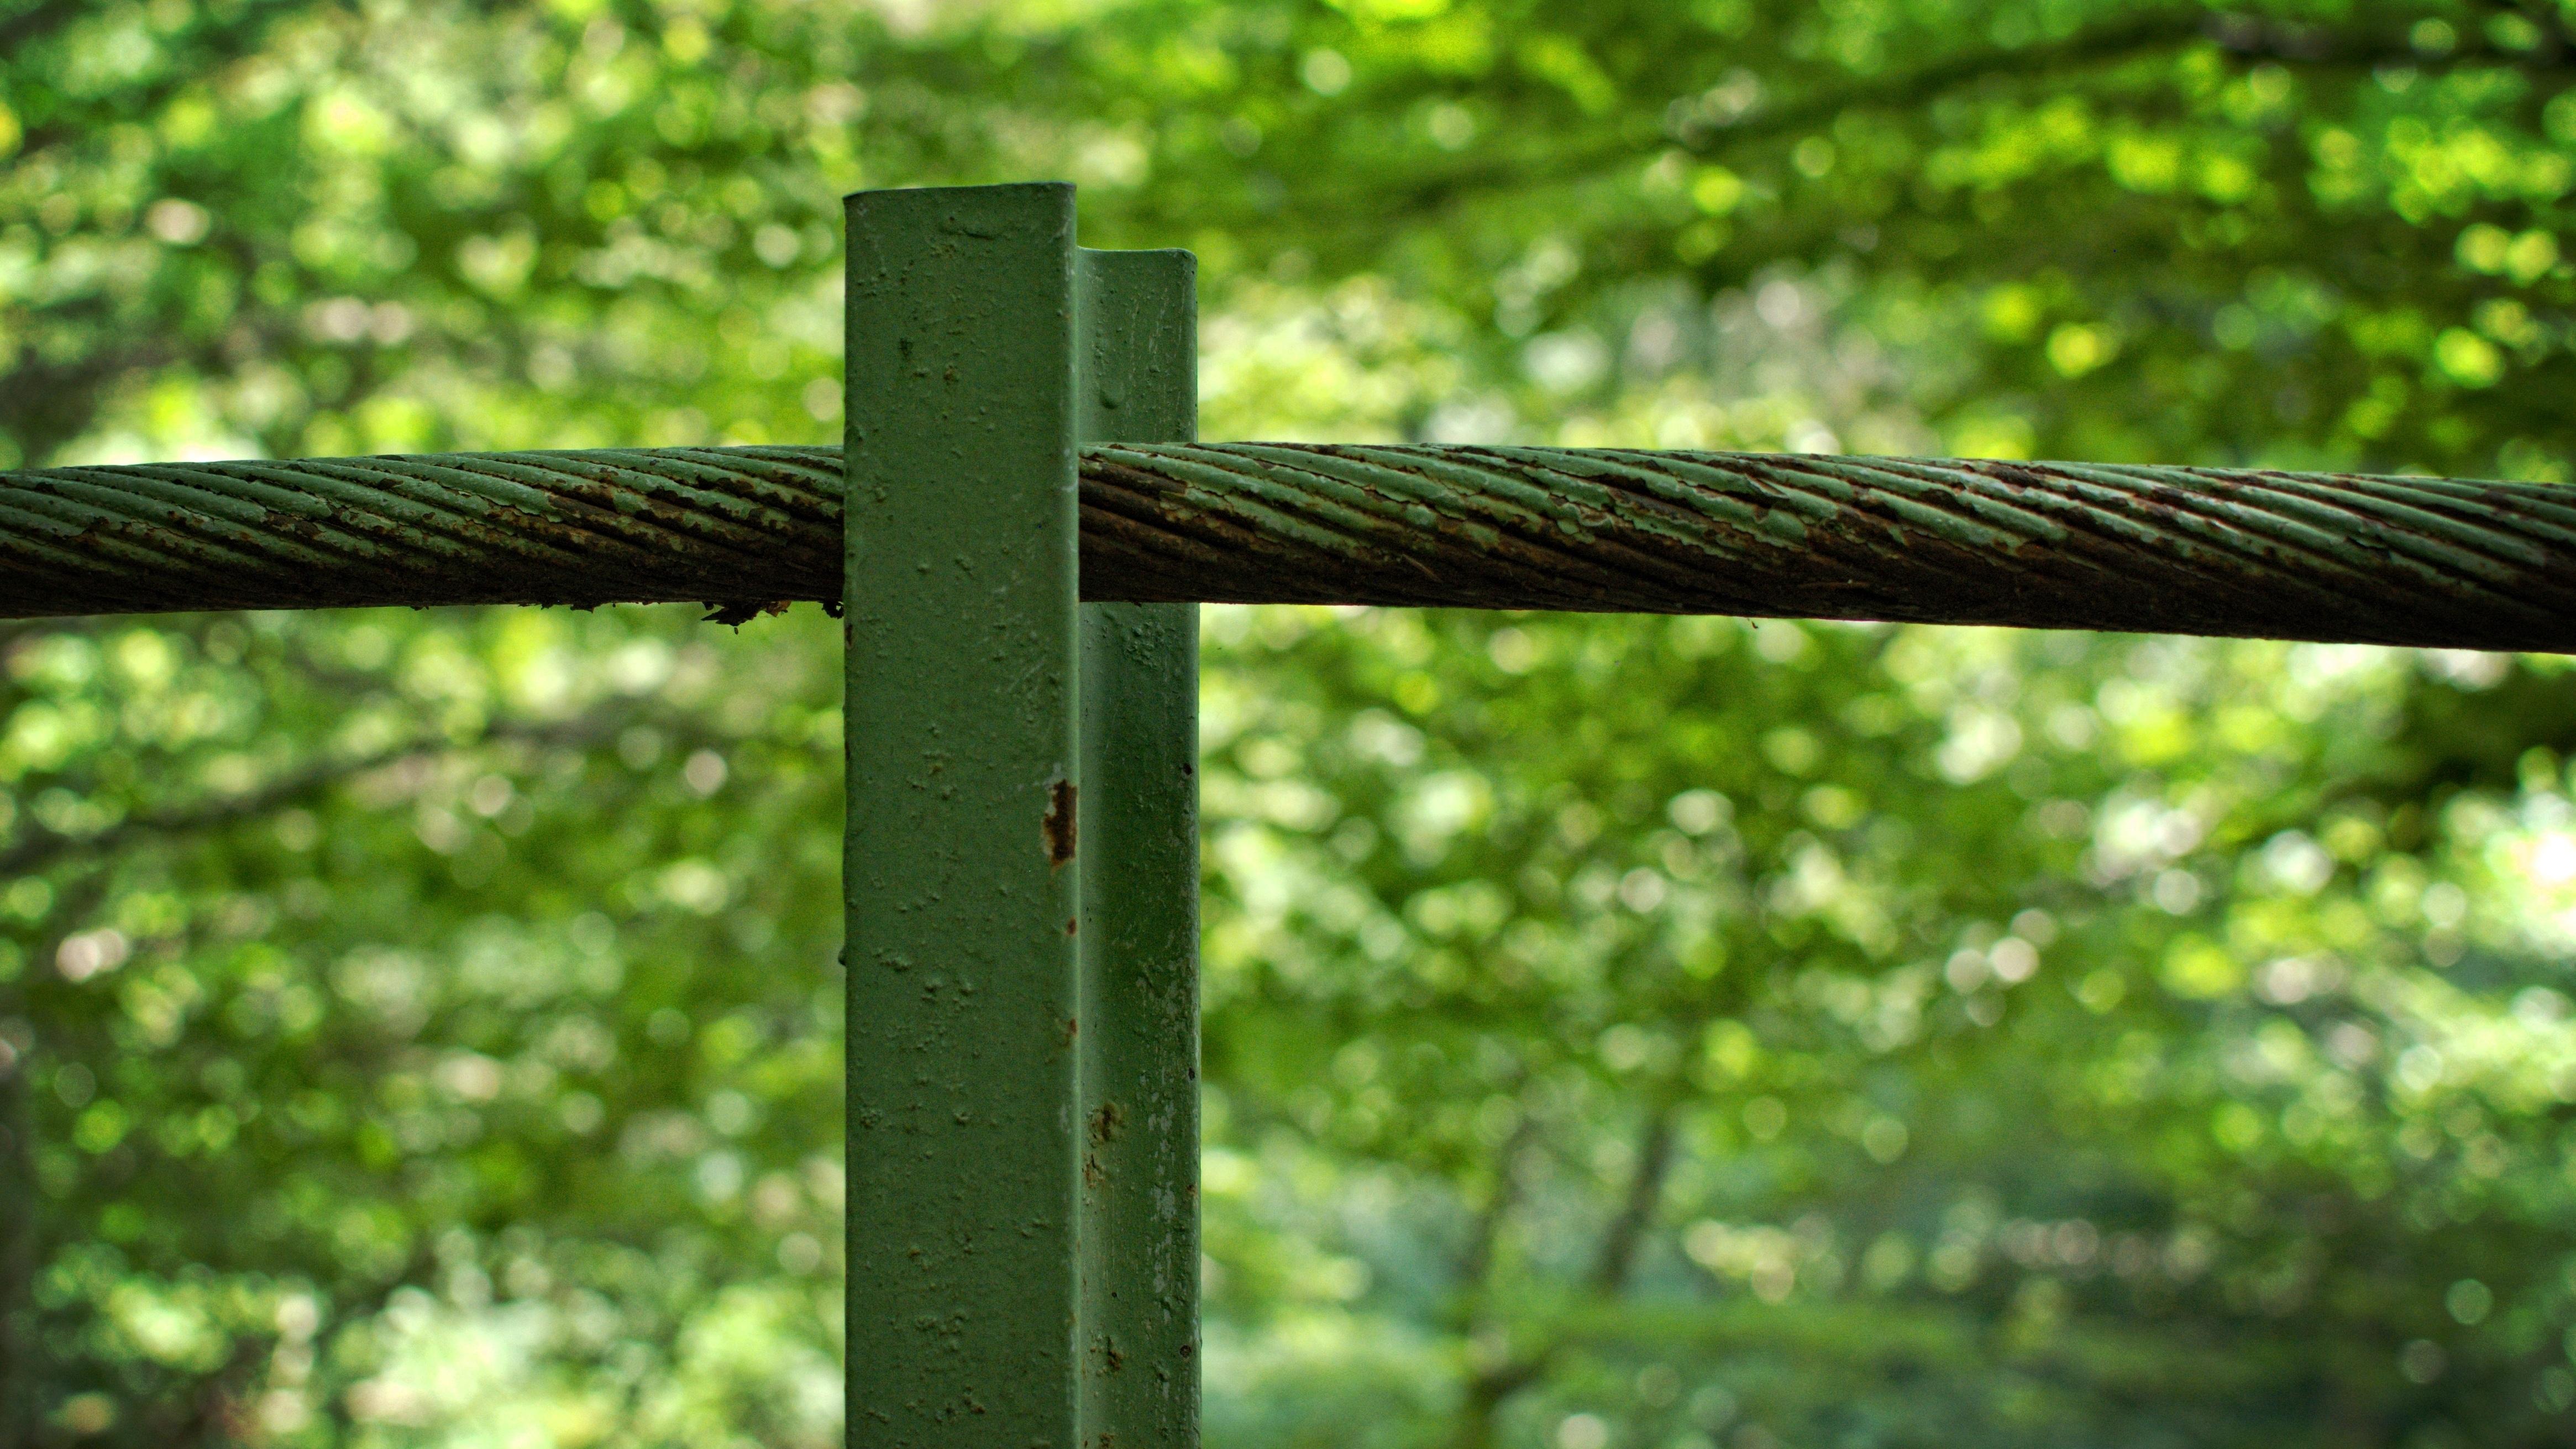 Kostenlose foto : Baum, Natur, Wald, Gras, Ast, Tau, Zaun, Post ...